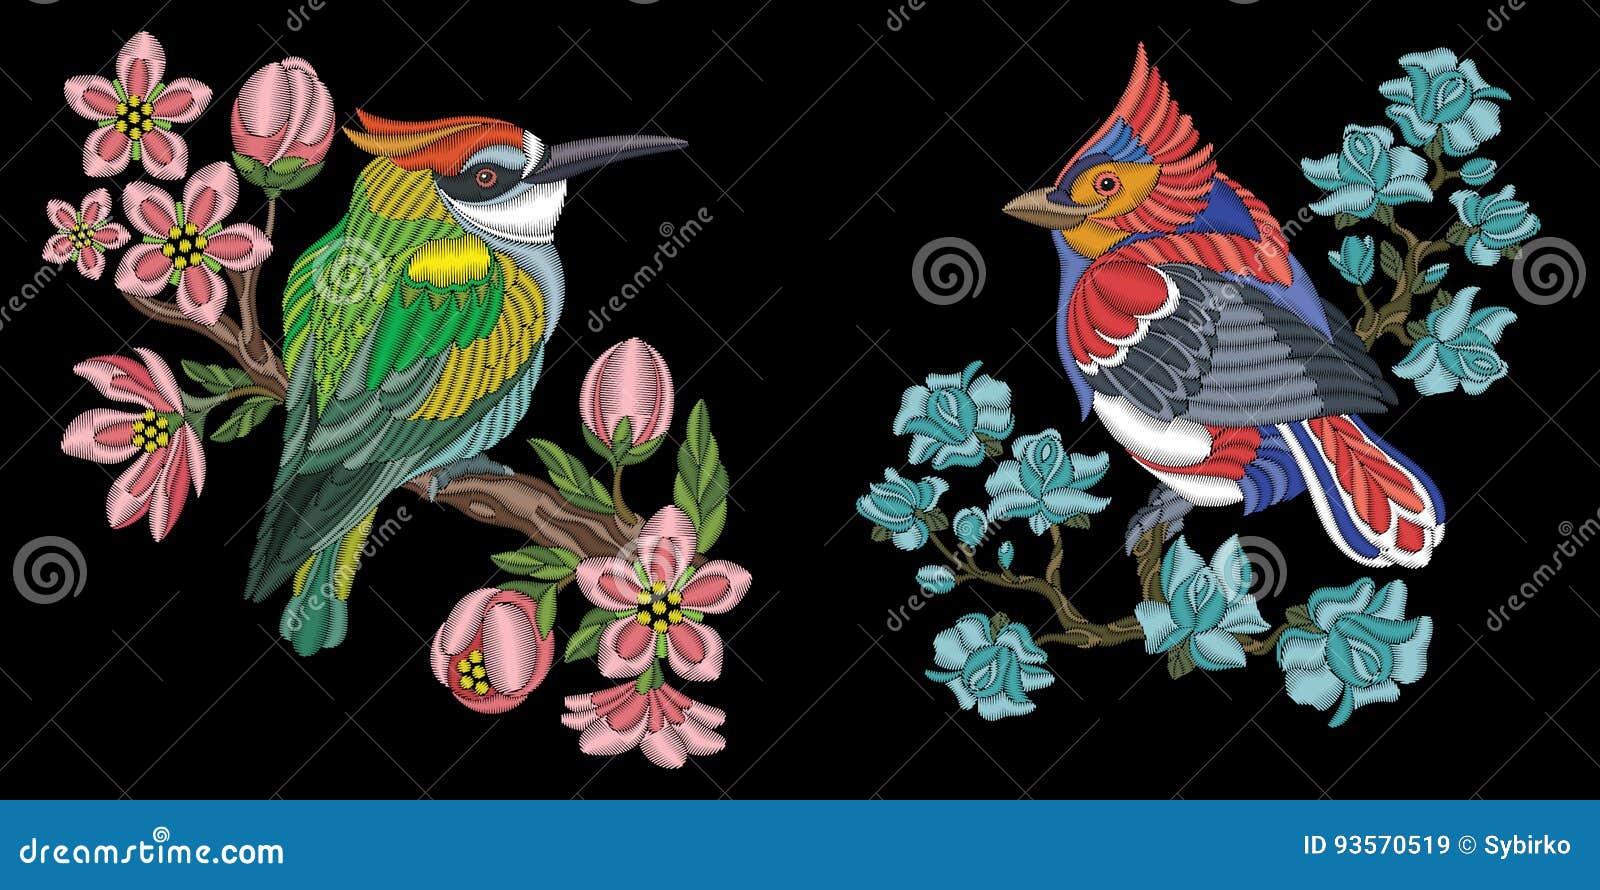 Kookaburra Cartoons Illustrations Amp Vector Stock Images